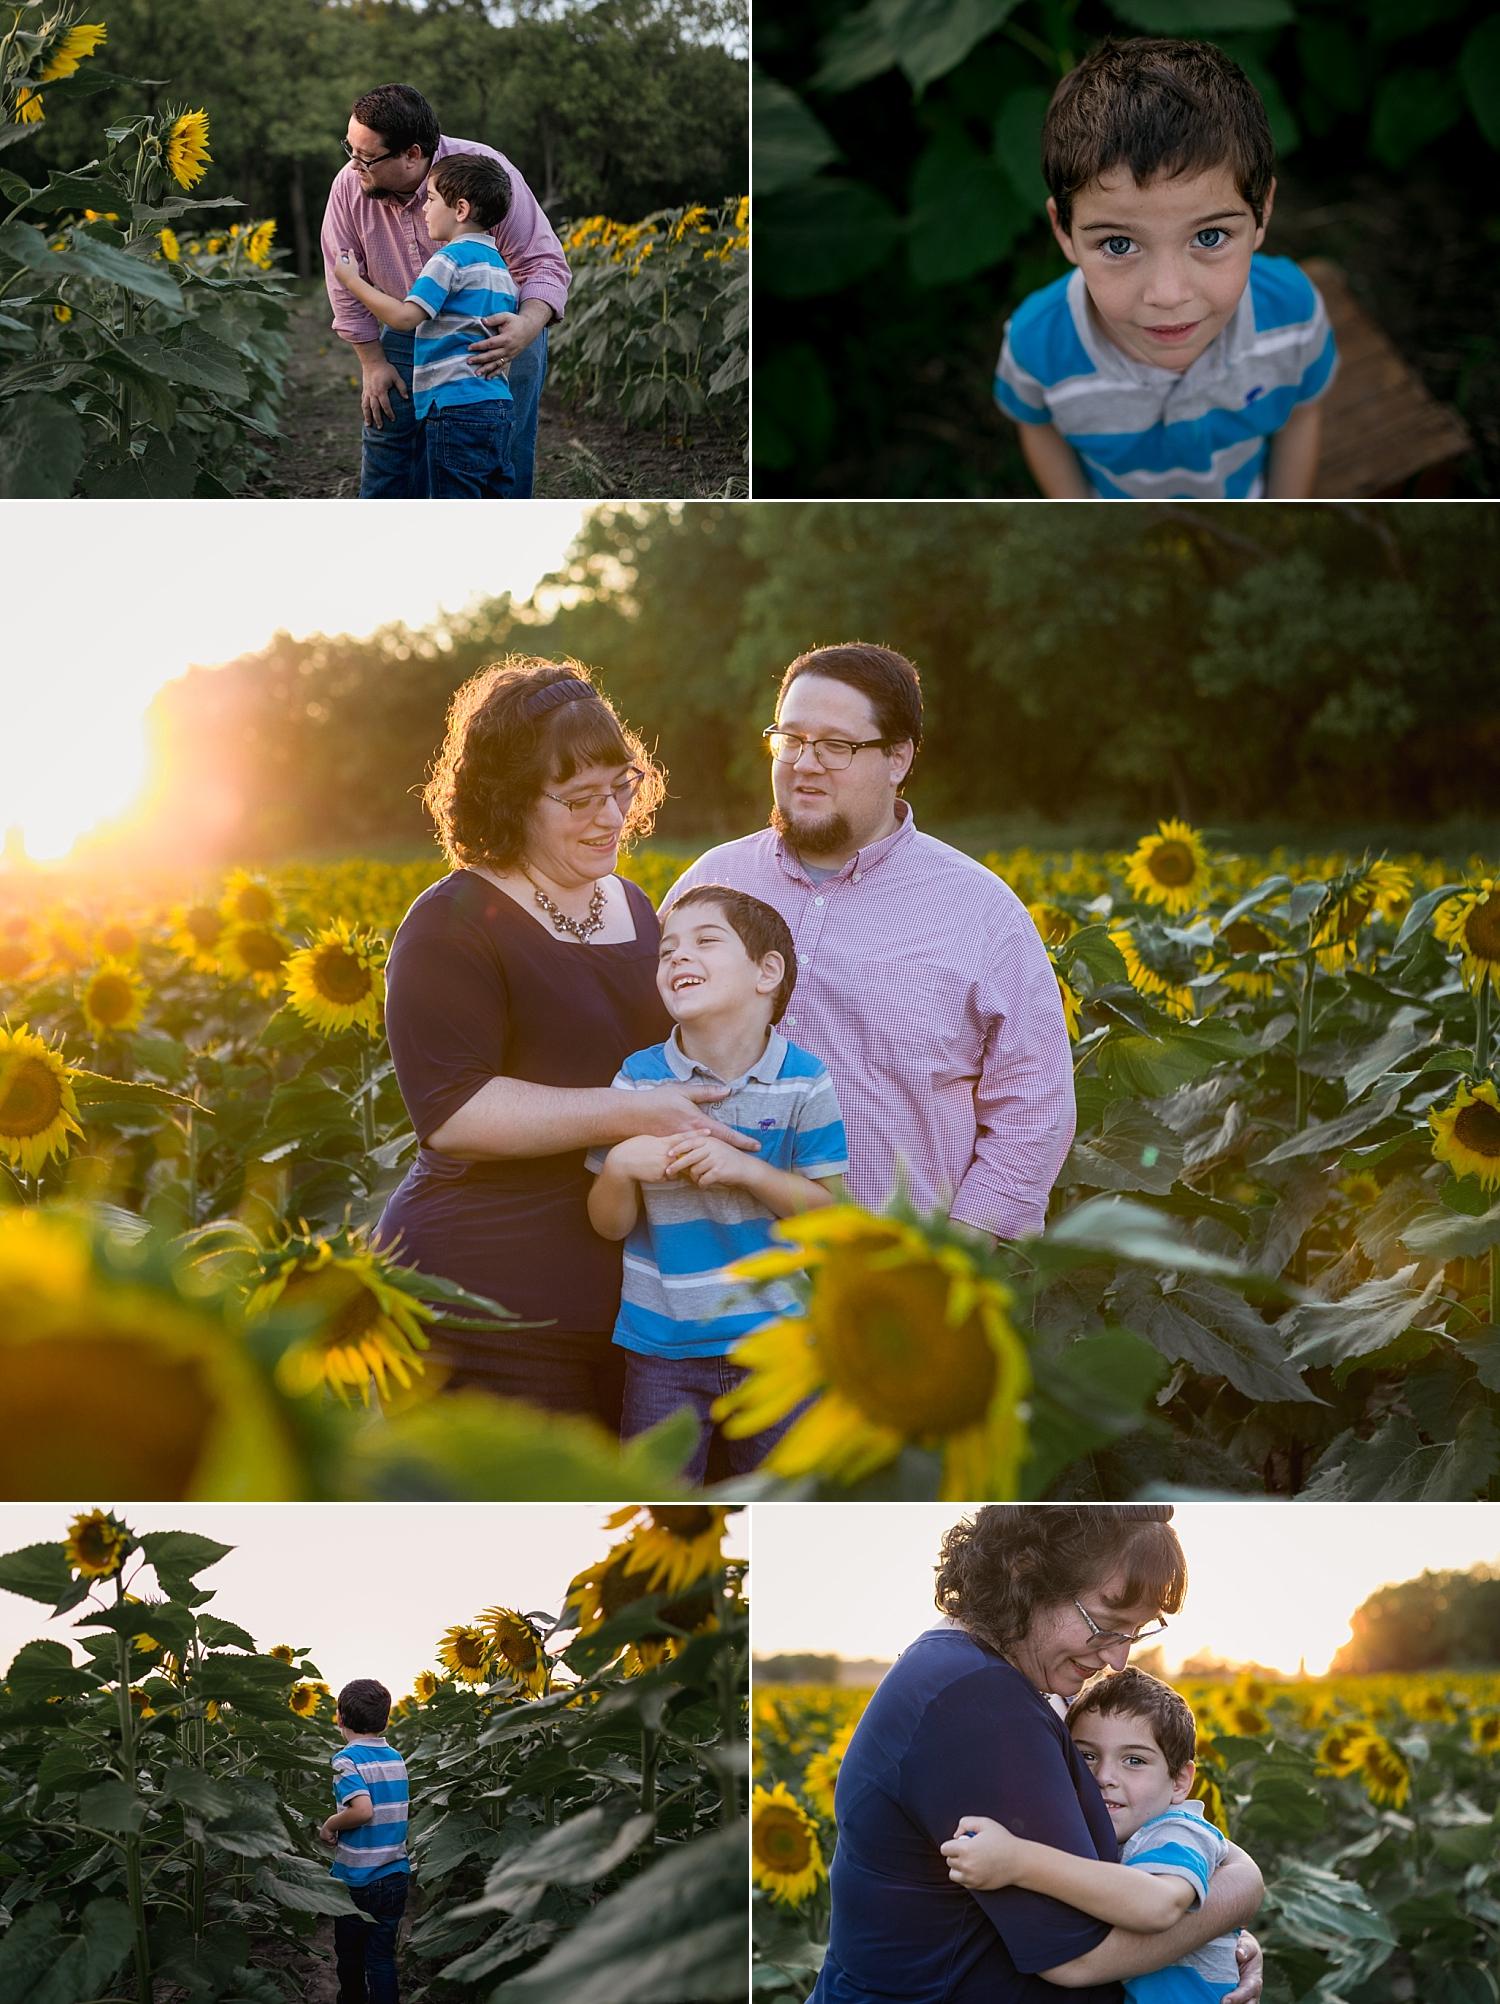 Britts-Farm-Sunflower-older-family-of-three-Mini-Family-Photo-Session-Manhattan-KS